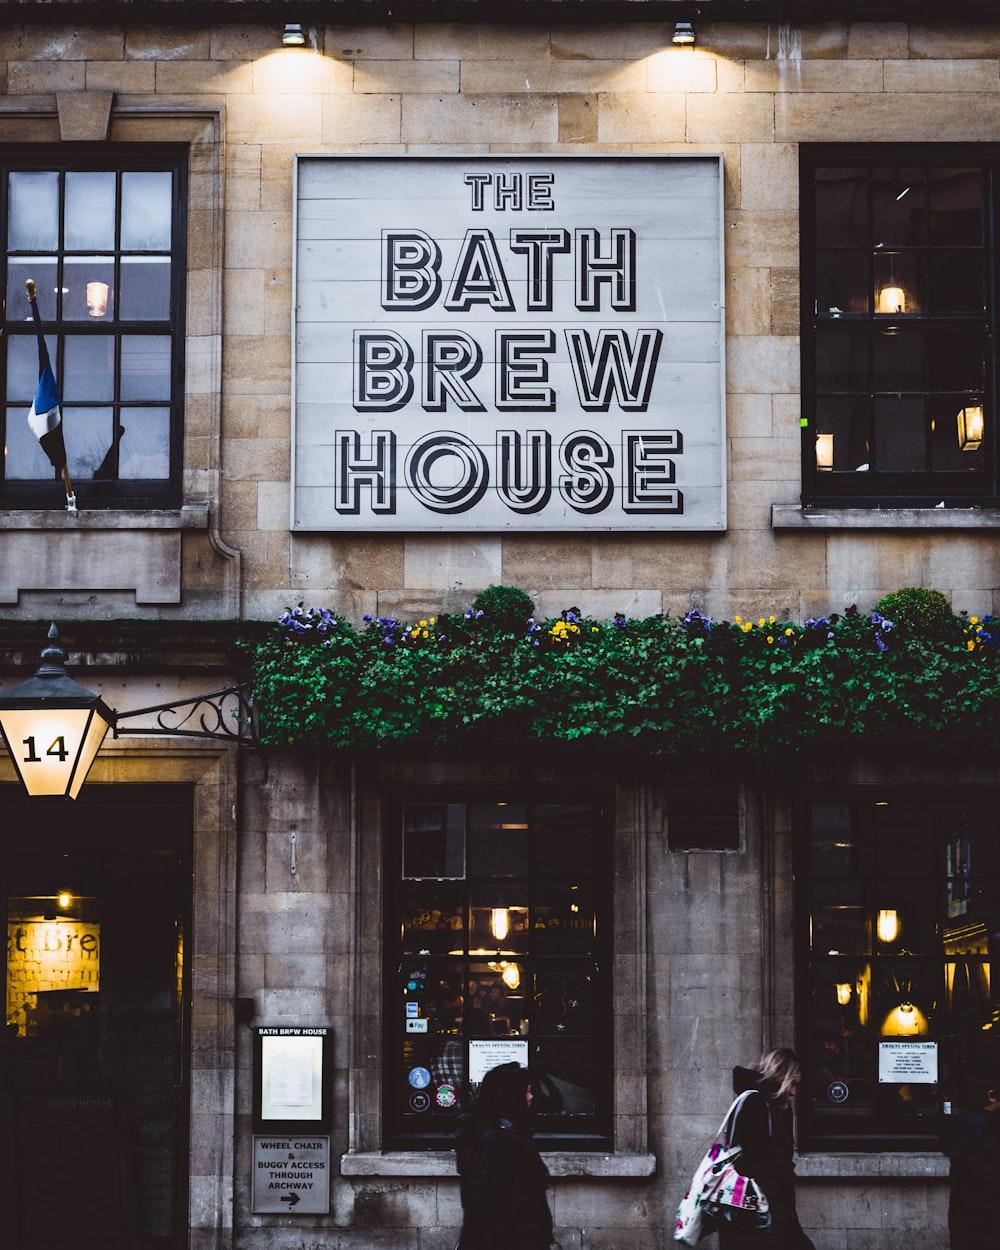 The Bath Brew House signage